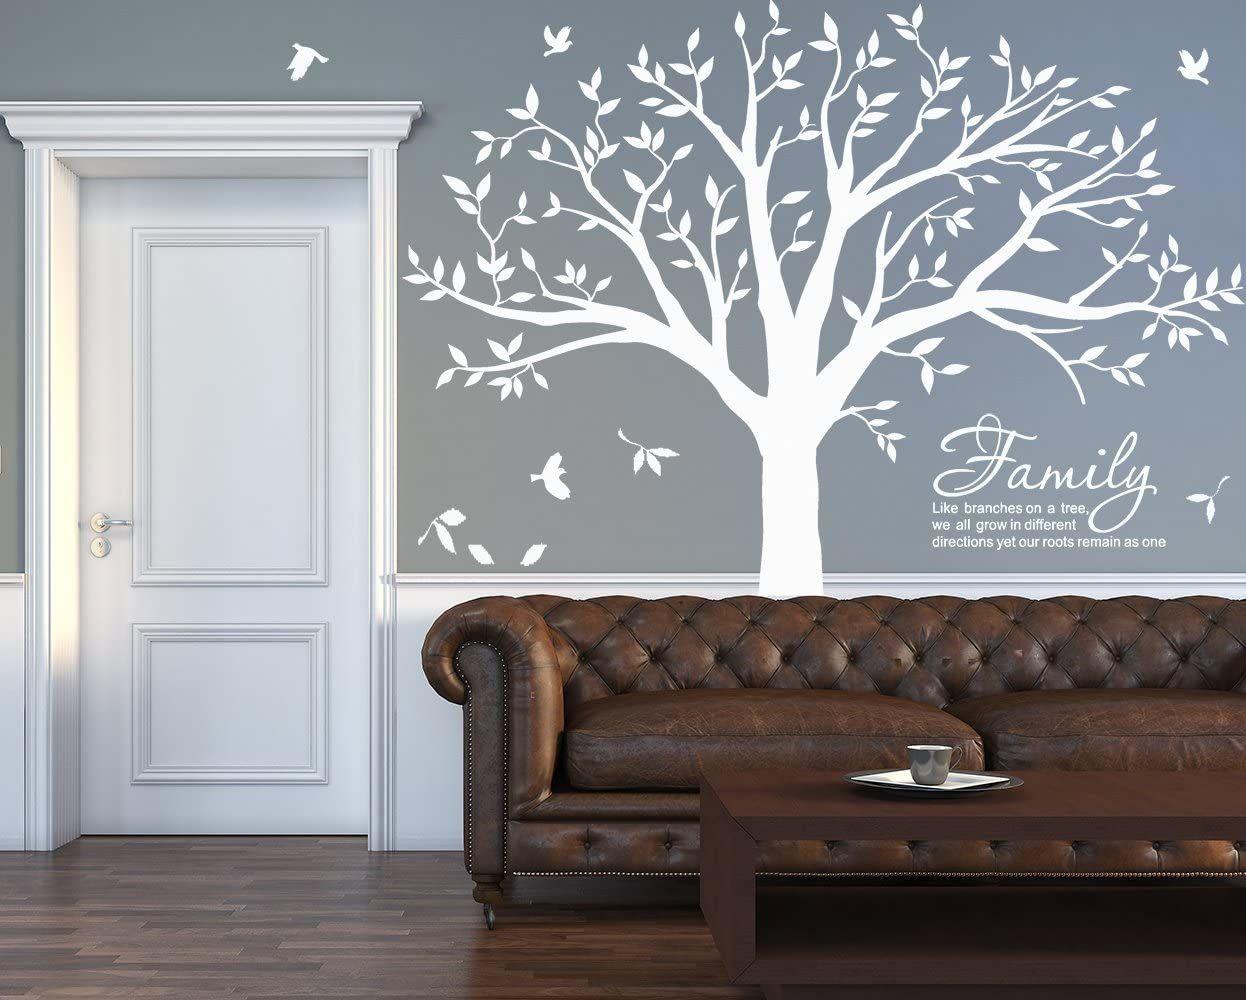 PVC Door Wall Sticker Decal For Home Hotel Bedroom Office Decor DIY Art Supply